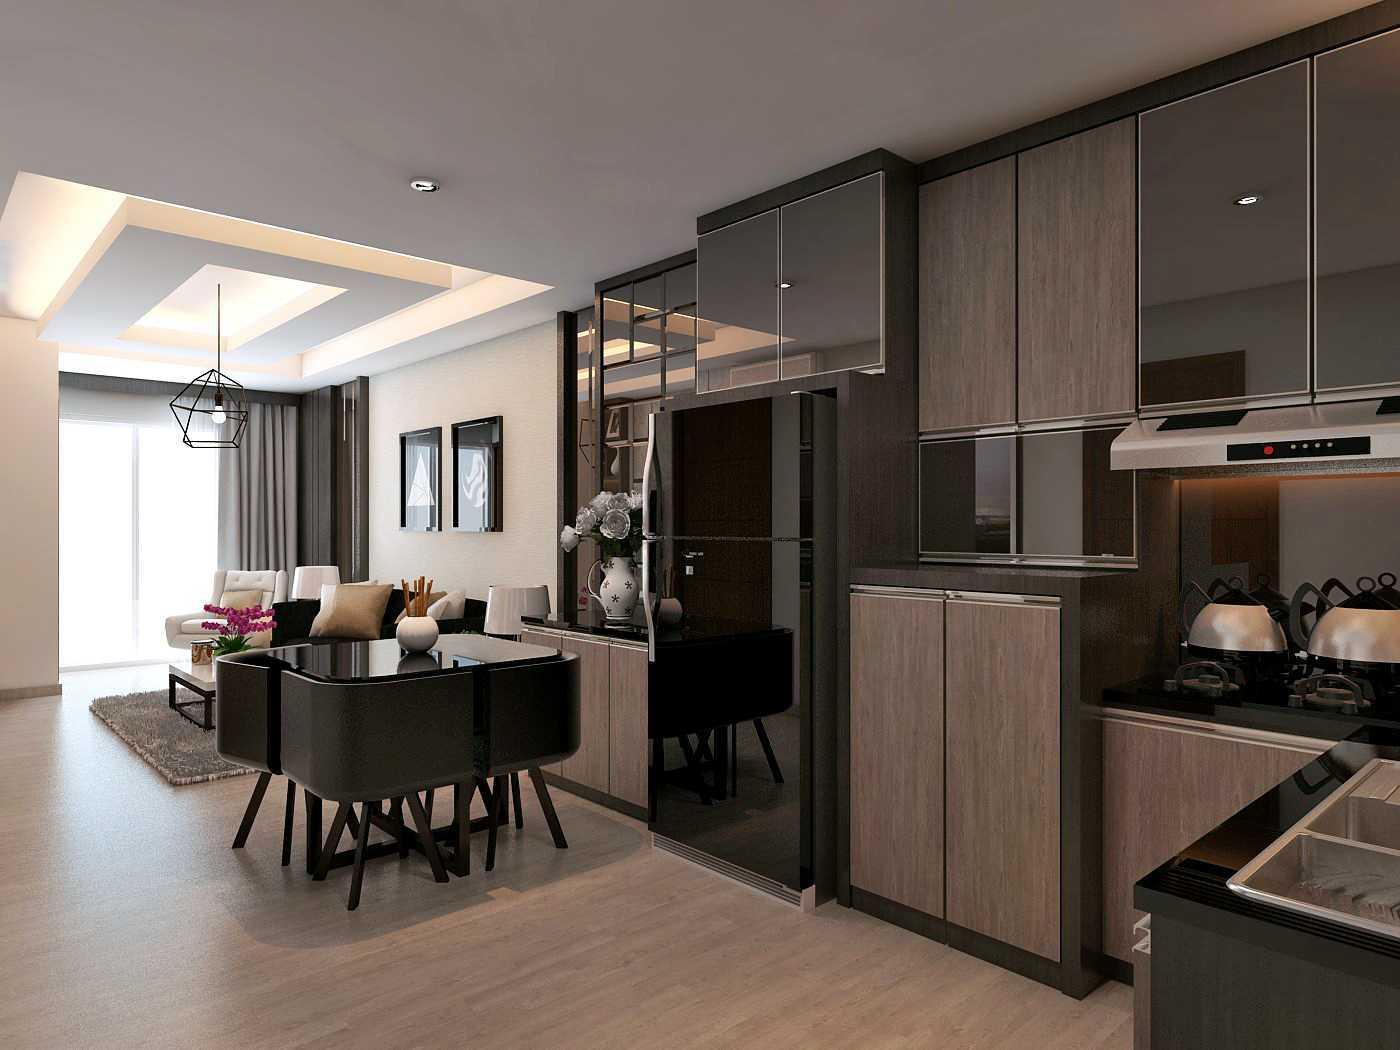 Habibullah Alfatih Condominium - Greenbay Pluit Jakarta, Indonesia Jakarta, Indonesia Dapur Kontemporer 35917